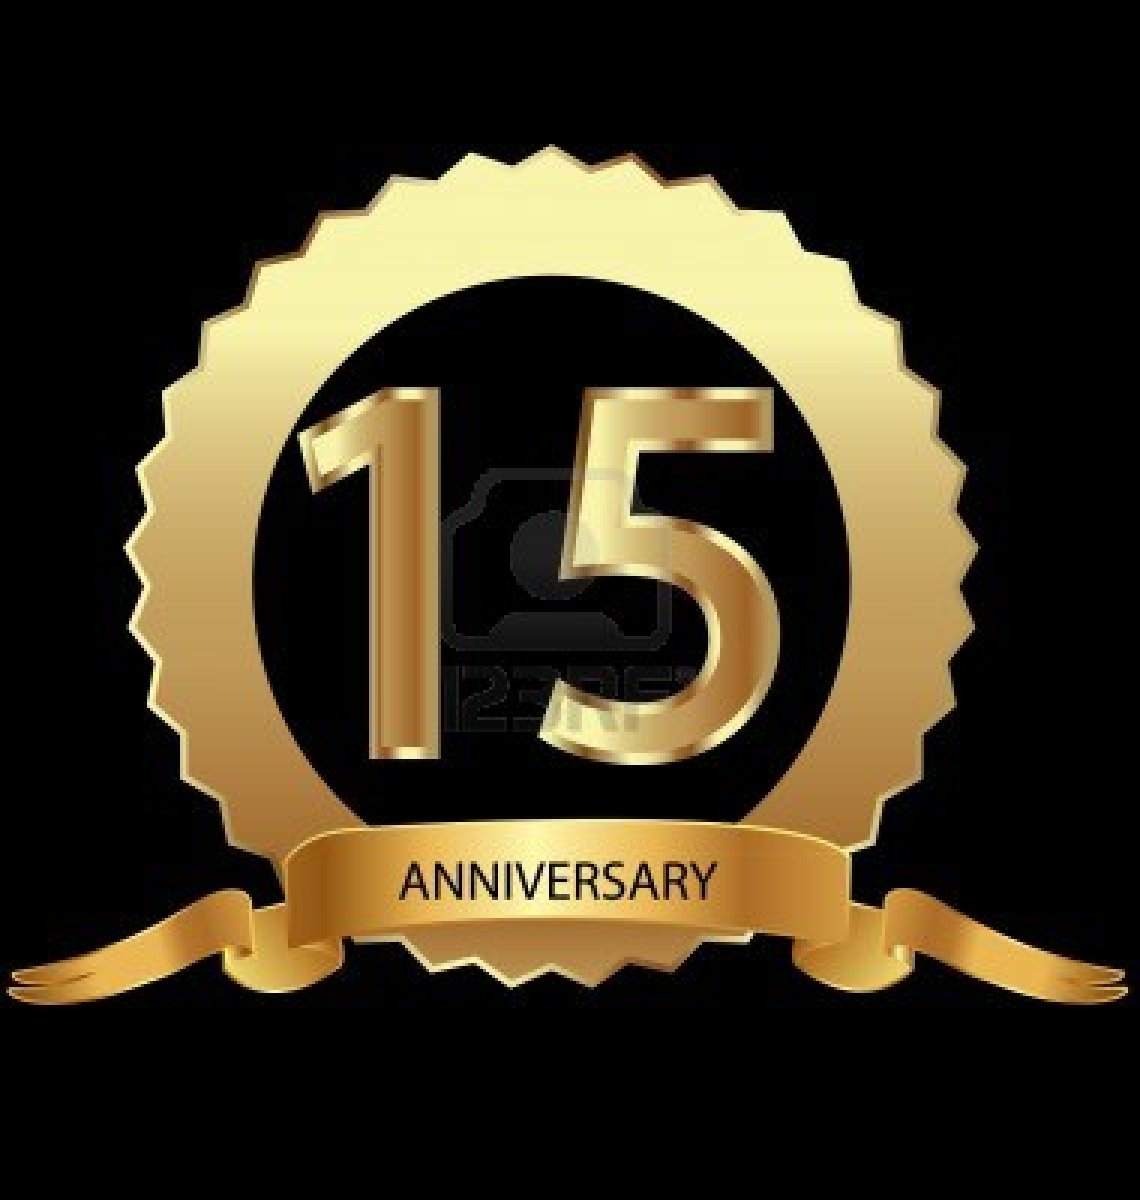 15 Year Wedding Anniversary Sayings